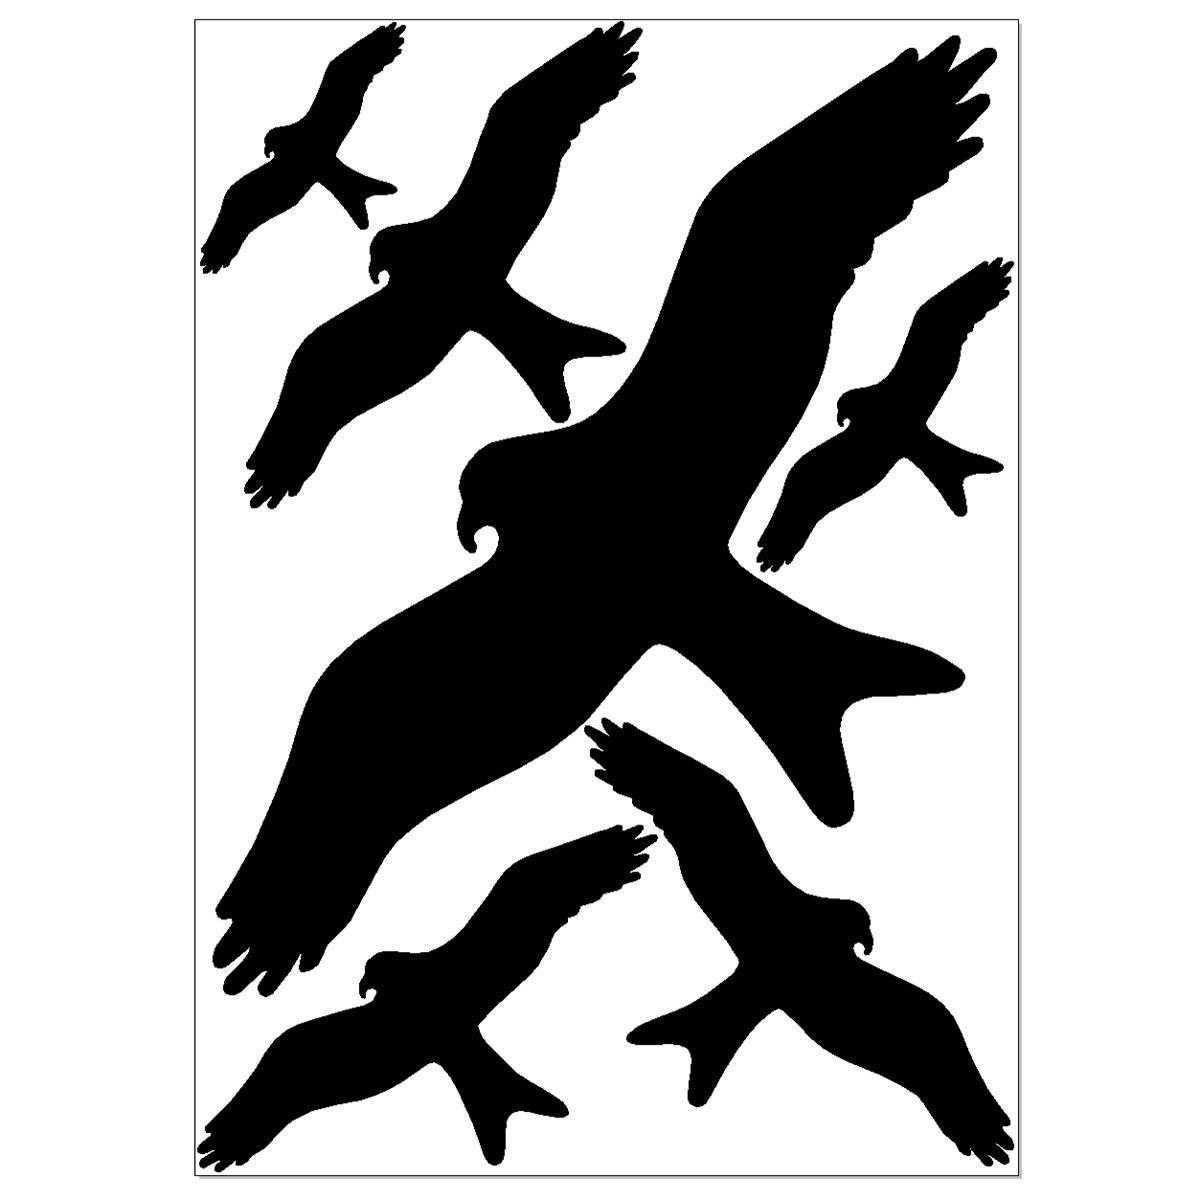 Bird scarer sticker window protection 6 bird silhouettes amazon co uk kitchen home